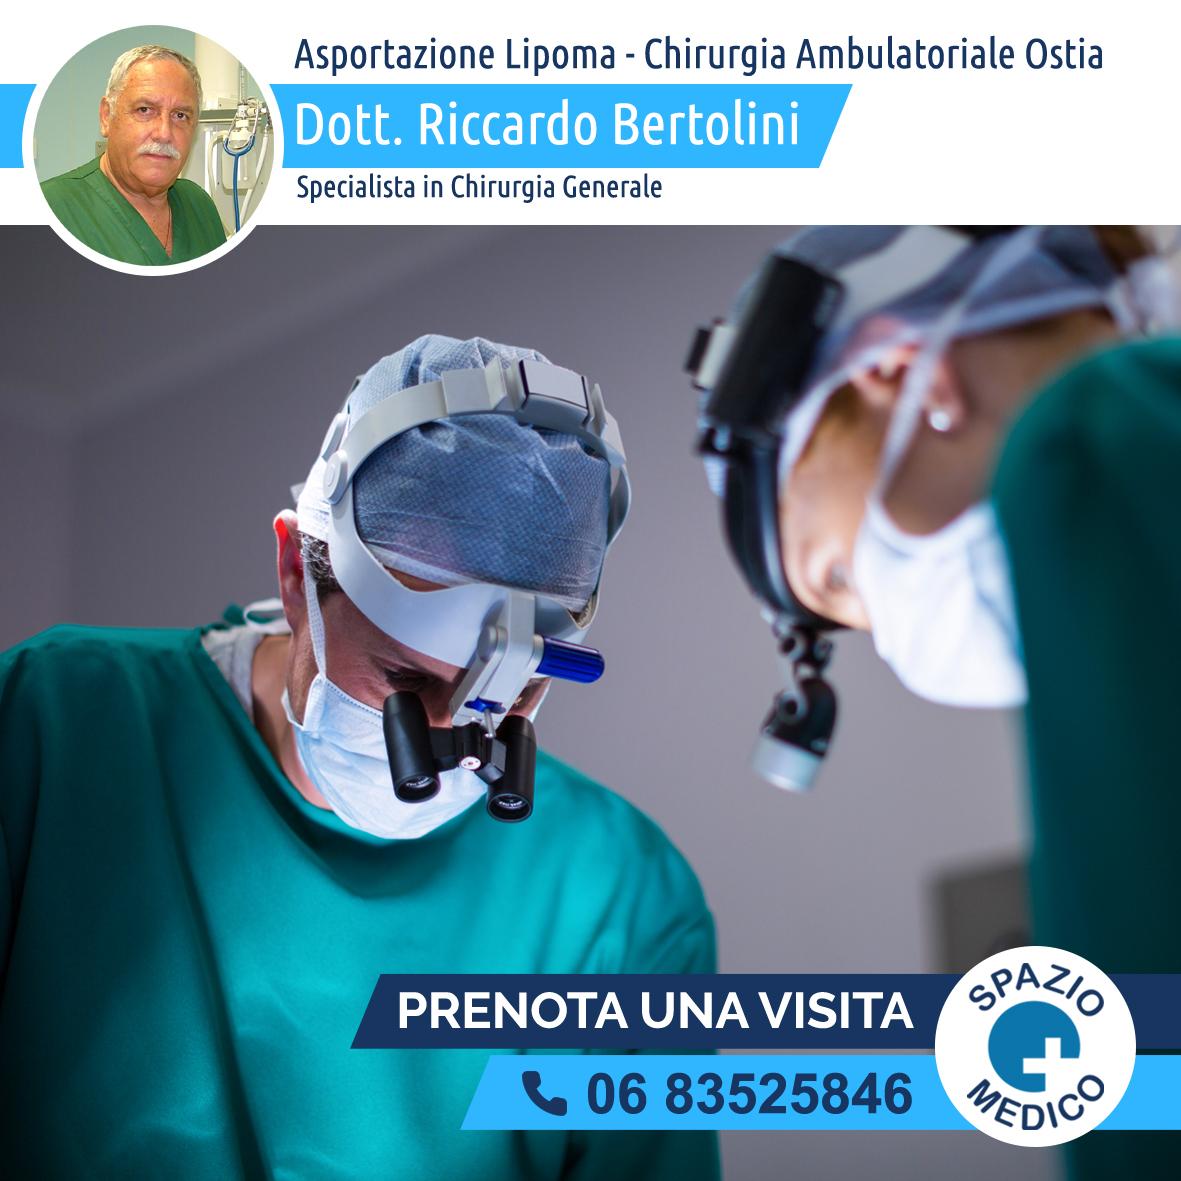 Lipoma-Chirurgia ambulatoriale